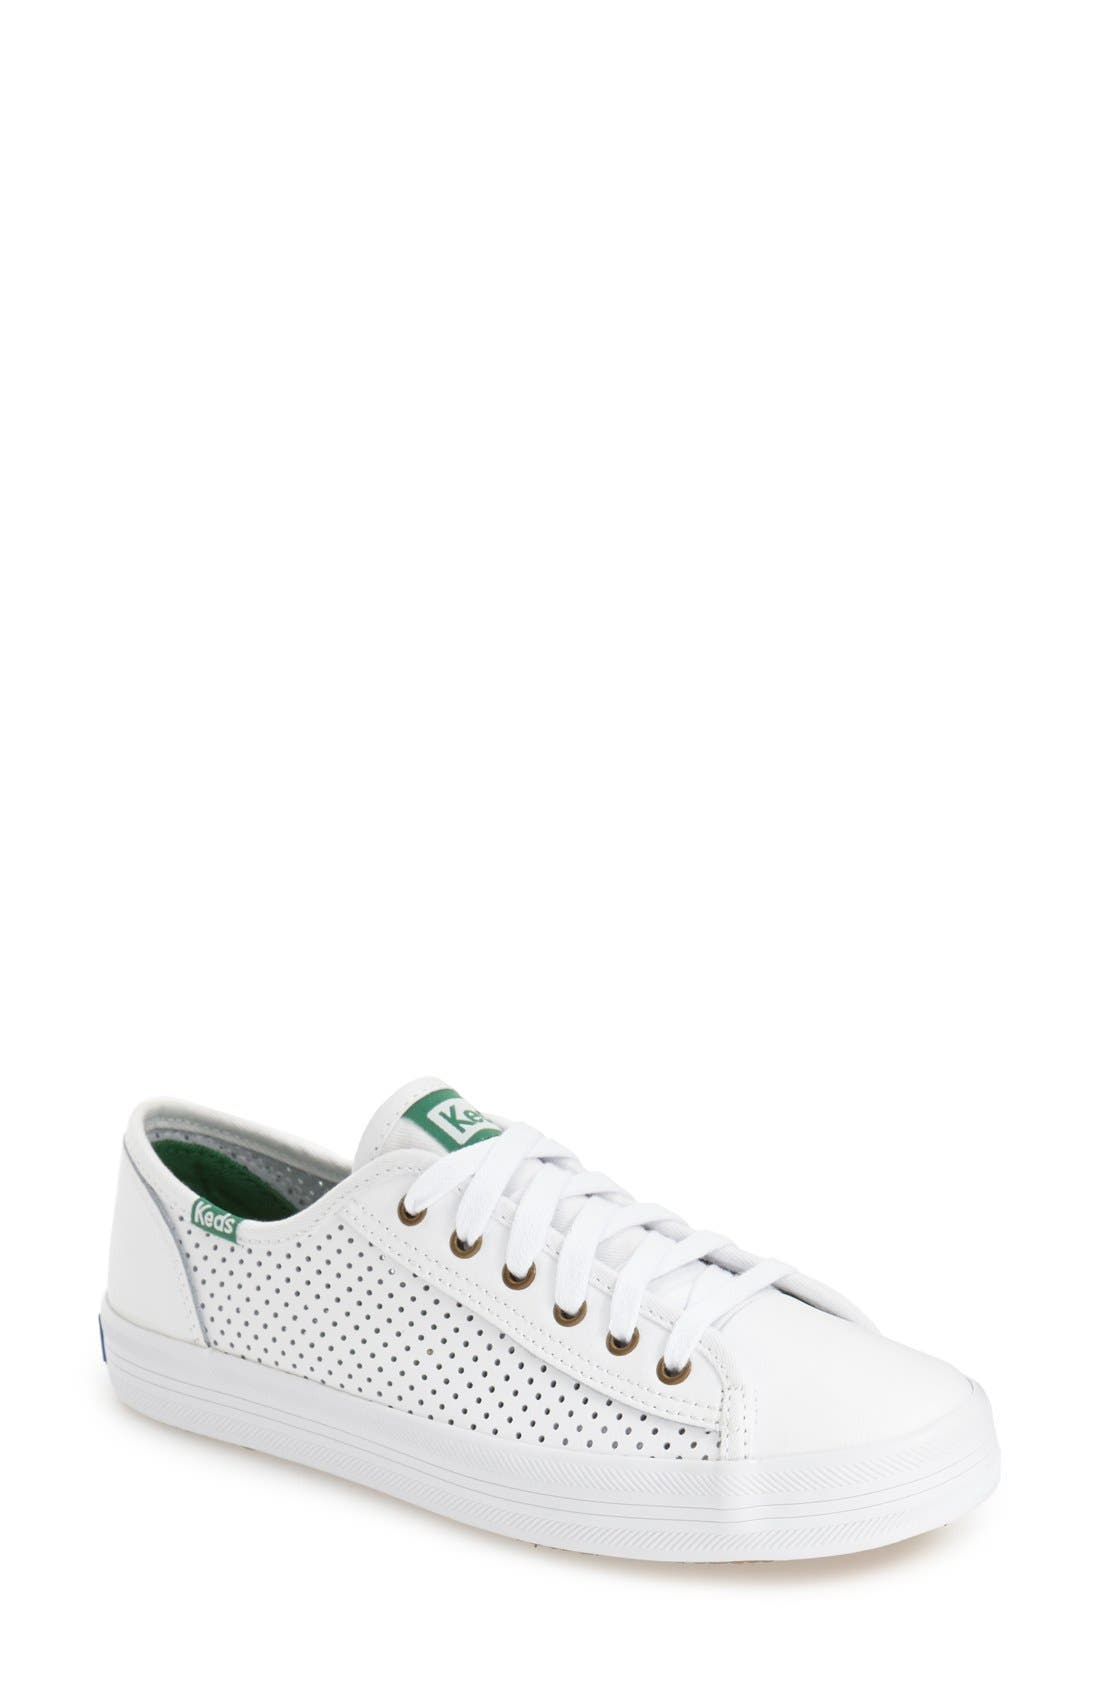 KEDS<SUP>®</SUP> 'Kickstart' Perforated Sneaker, Main, color, 100